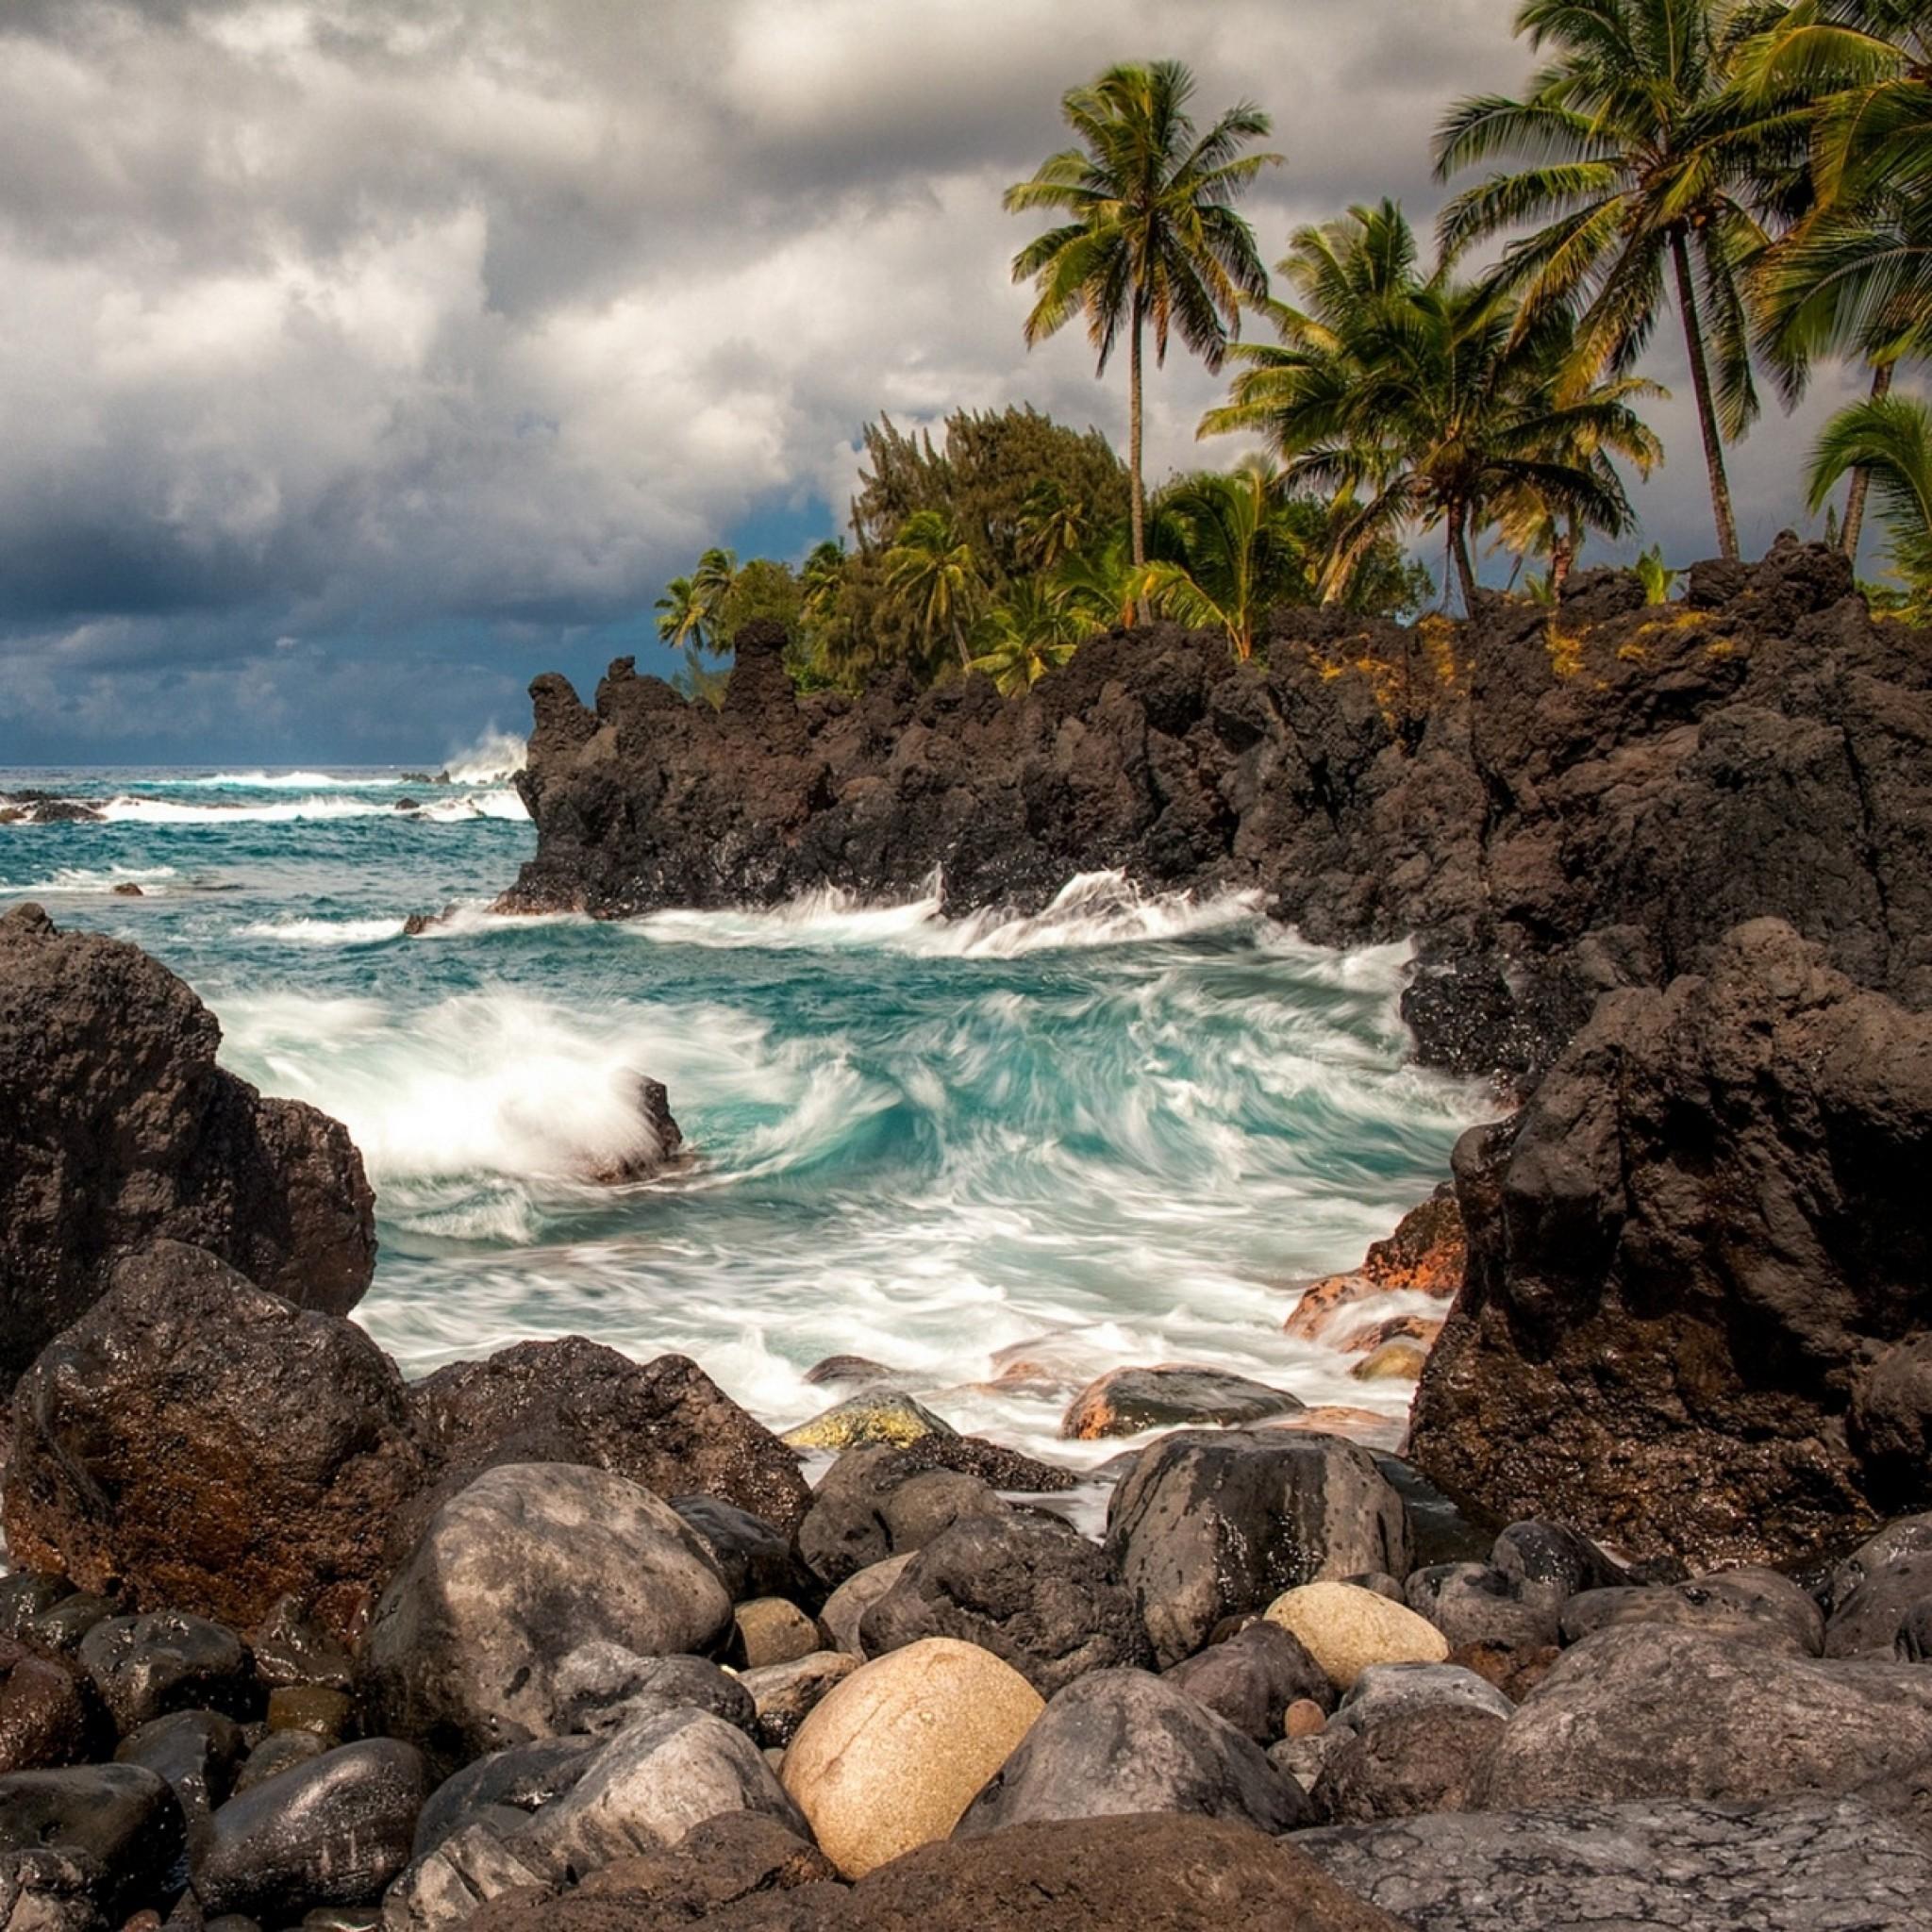 Preview wallpaper maui, hawaii, pacific ocean, cliffs, rocks, surf, palm